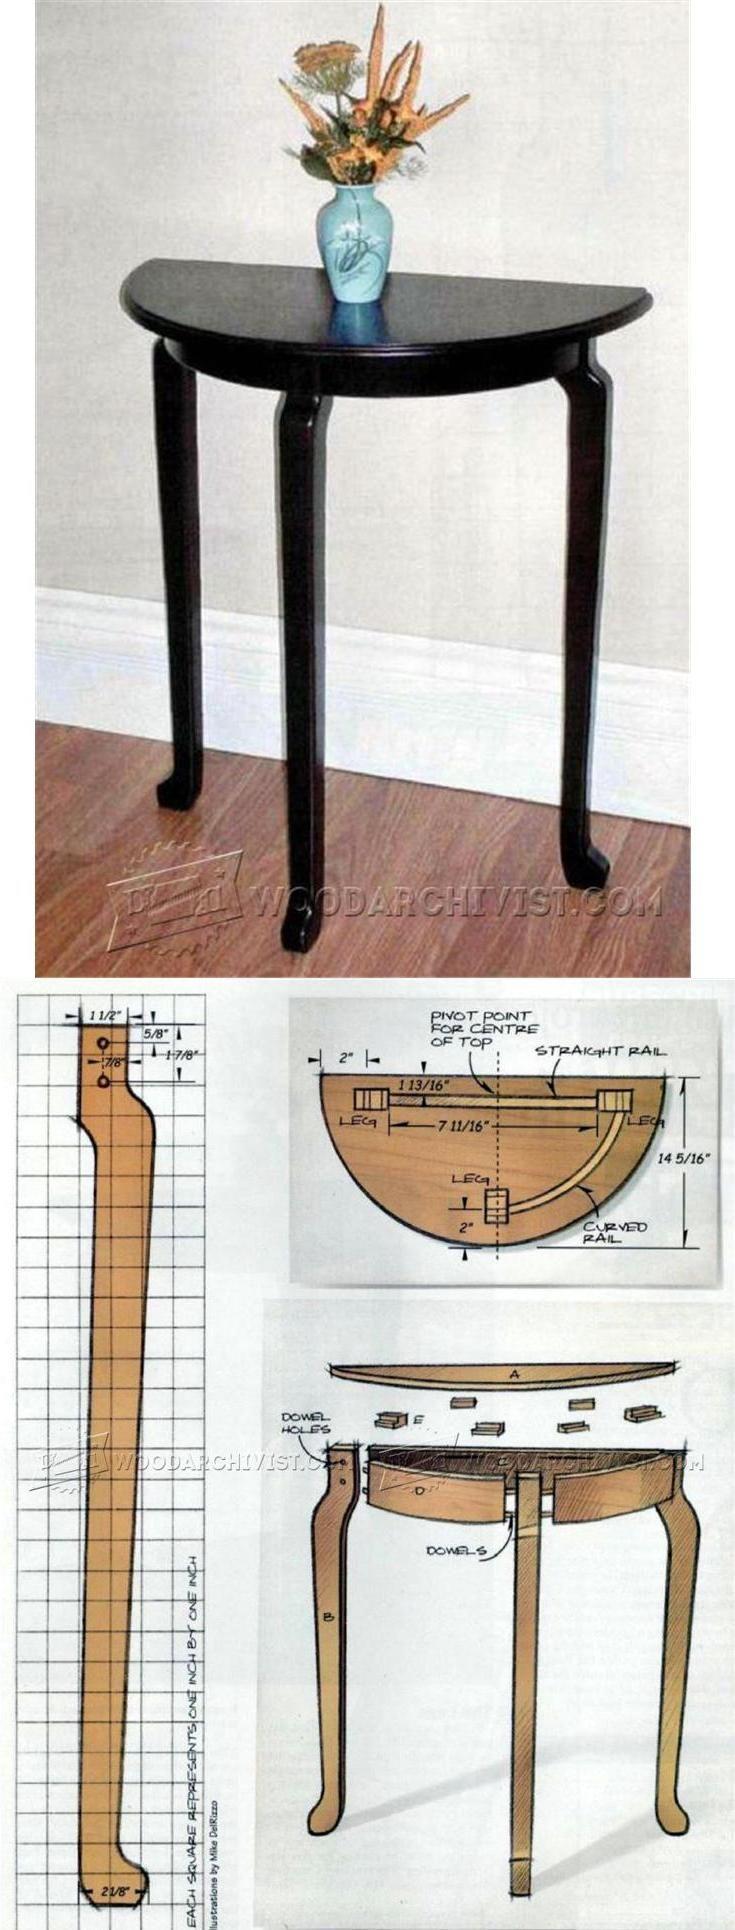 Demilune Table Plans -  Furniture Plans and Projects  | WoodArchivist.com